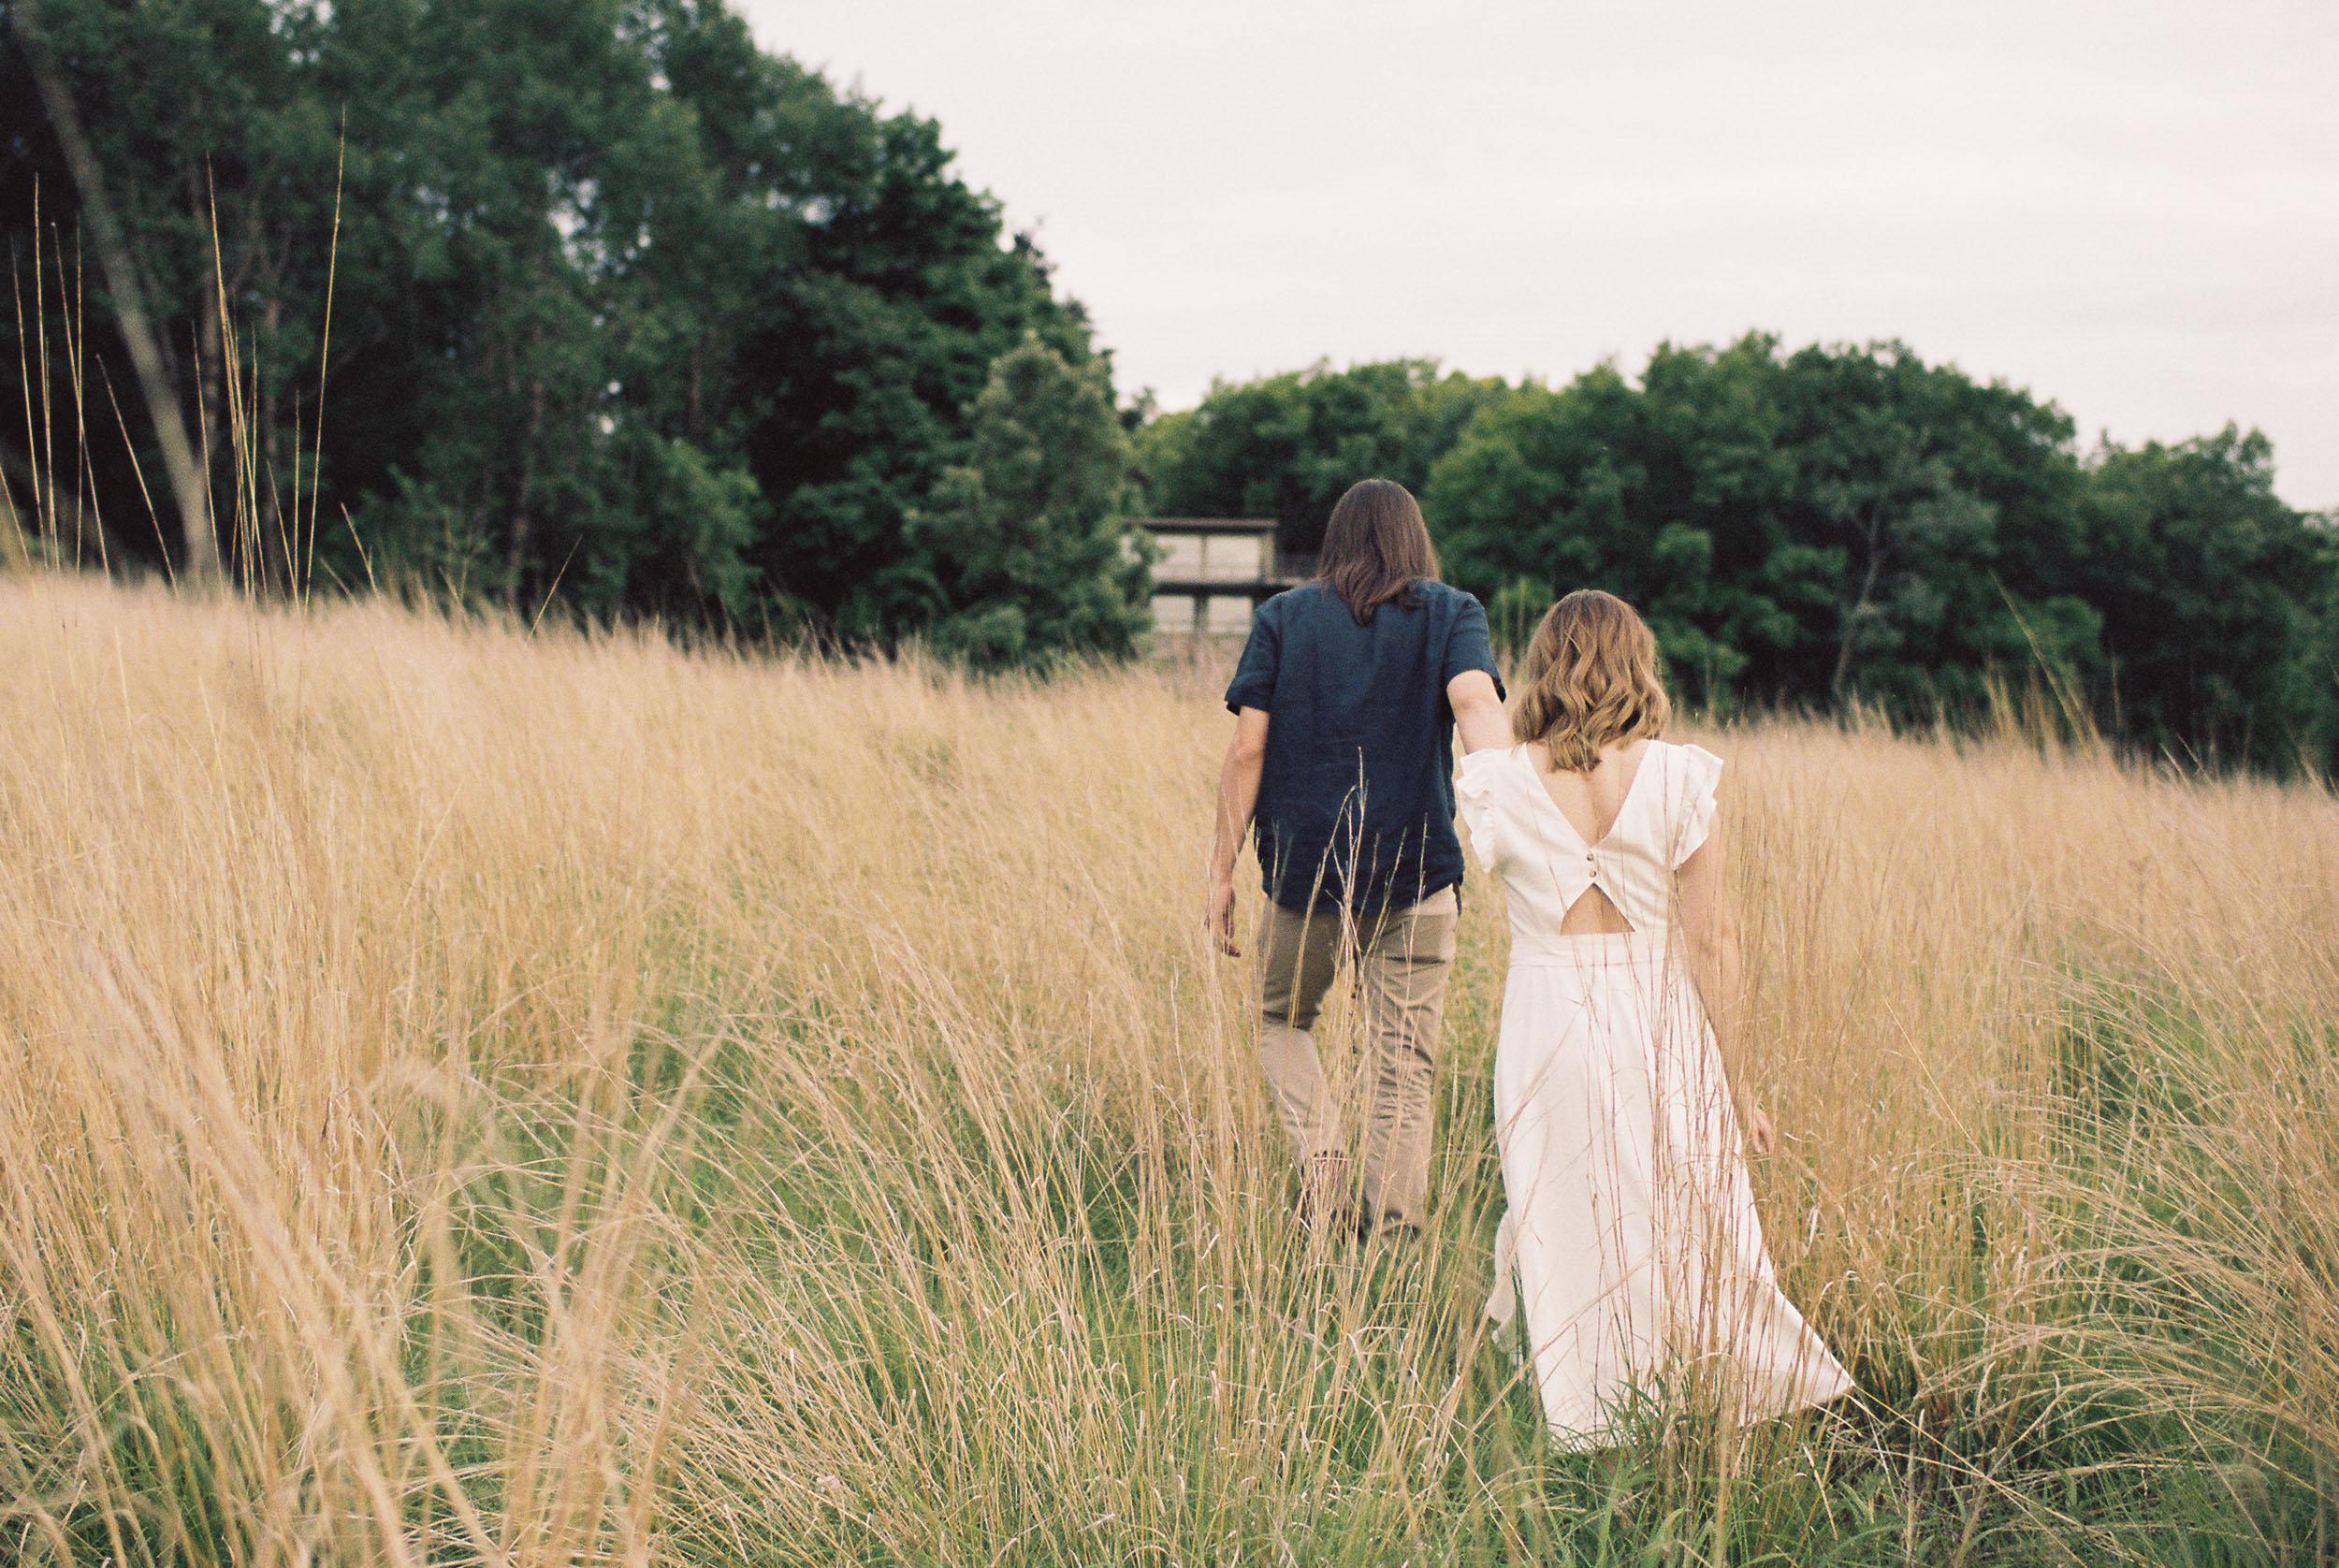 Man leading his fiancé through a field